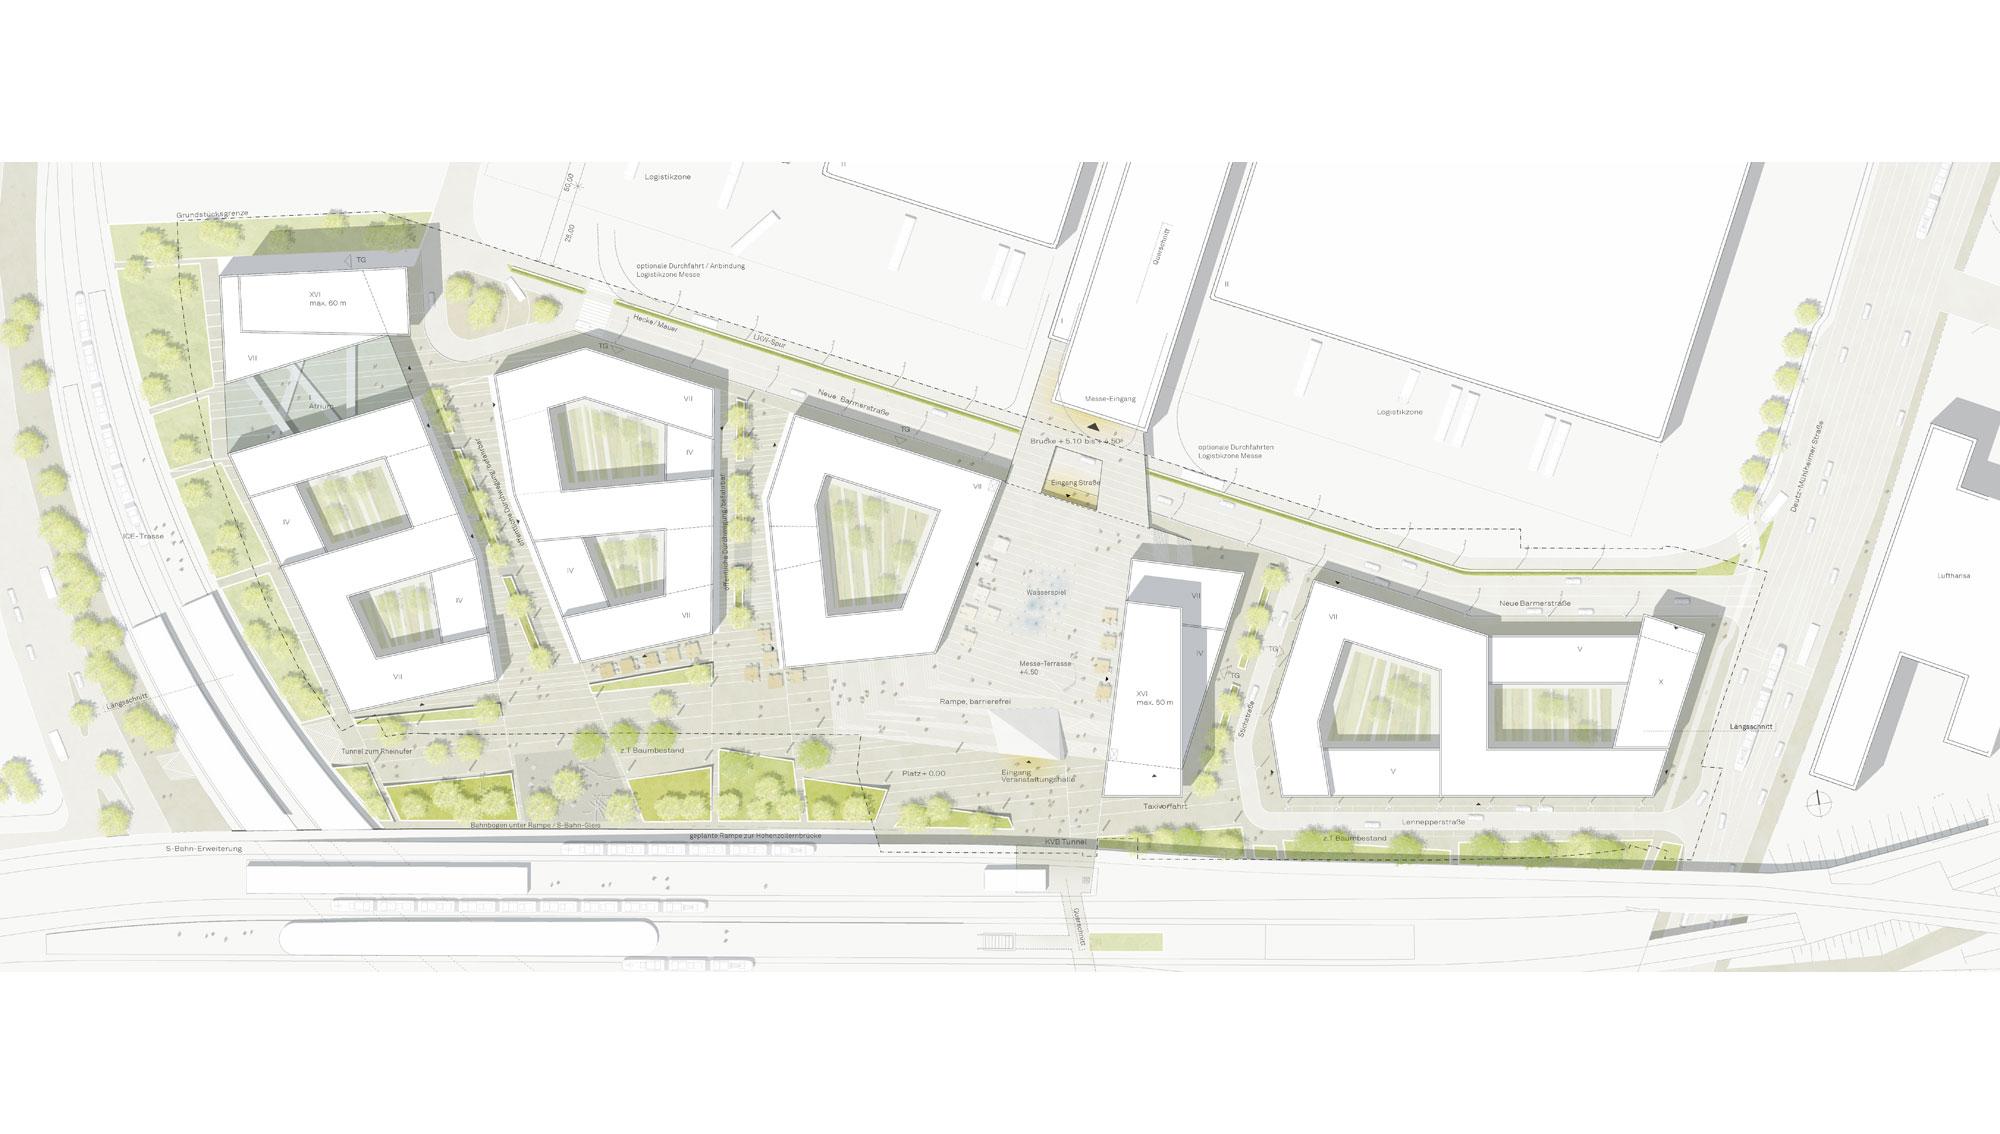 Landschaftsarchitekten Köln rmp stephan lenzen landschaftsarchitekten the messe city cologne